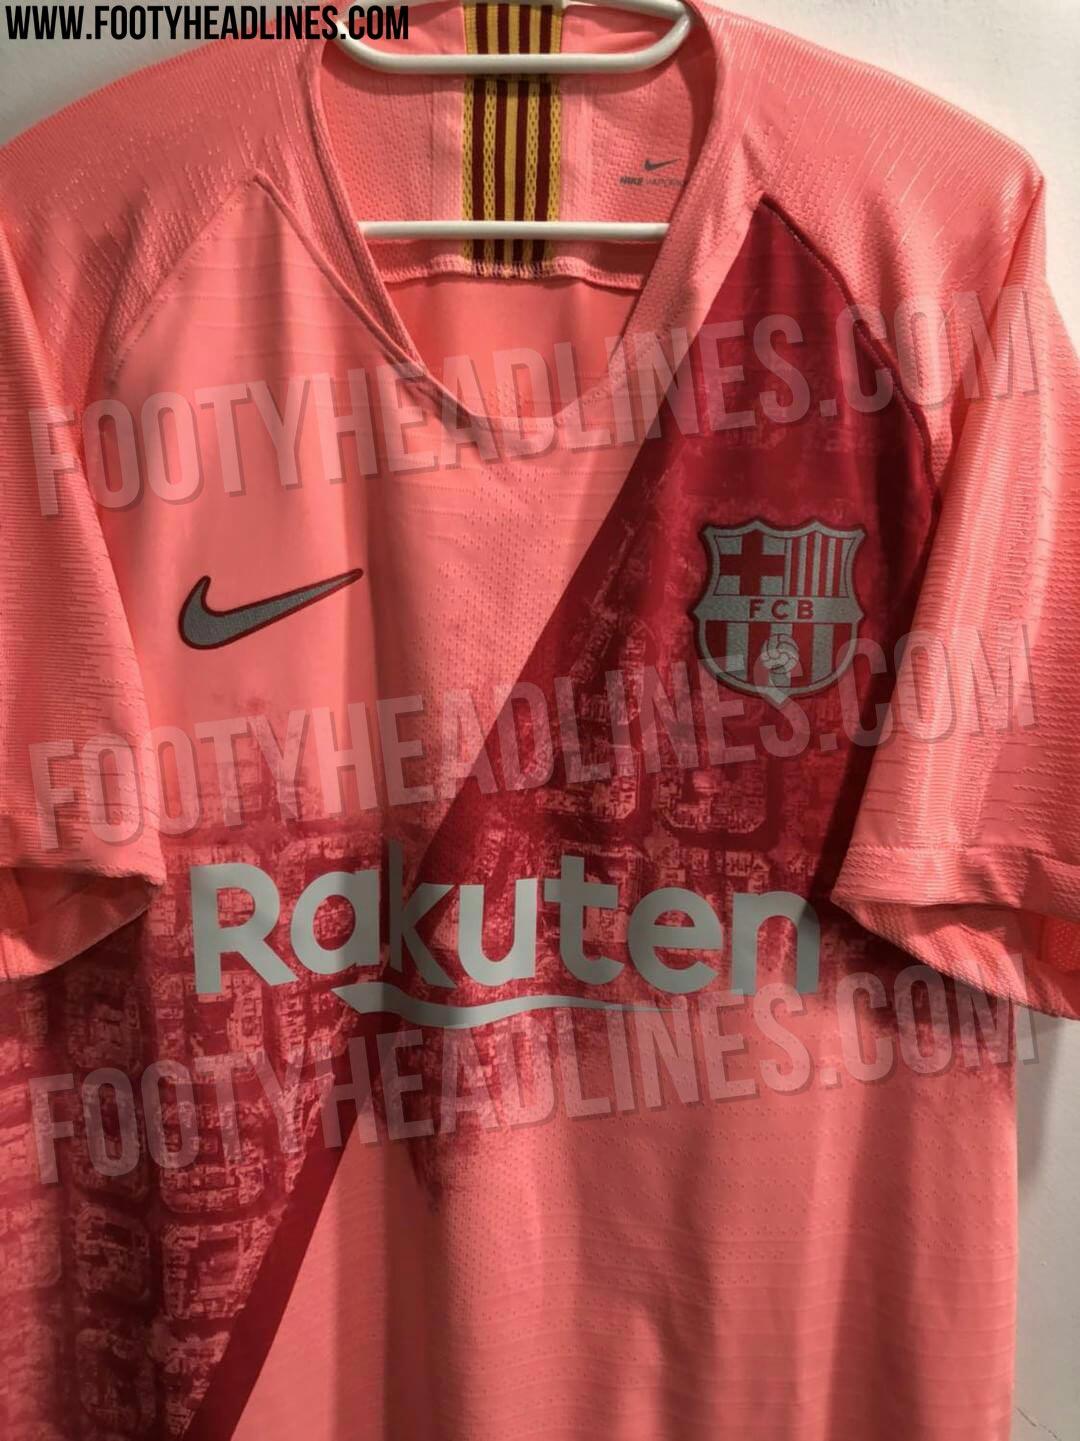 59b7d1eb6 Nike FC Barcelona 18-19 Third Kit Leaked - Sports kicks